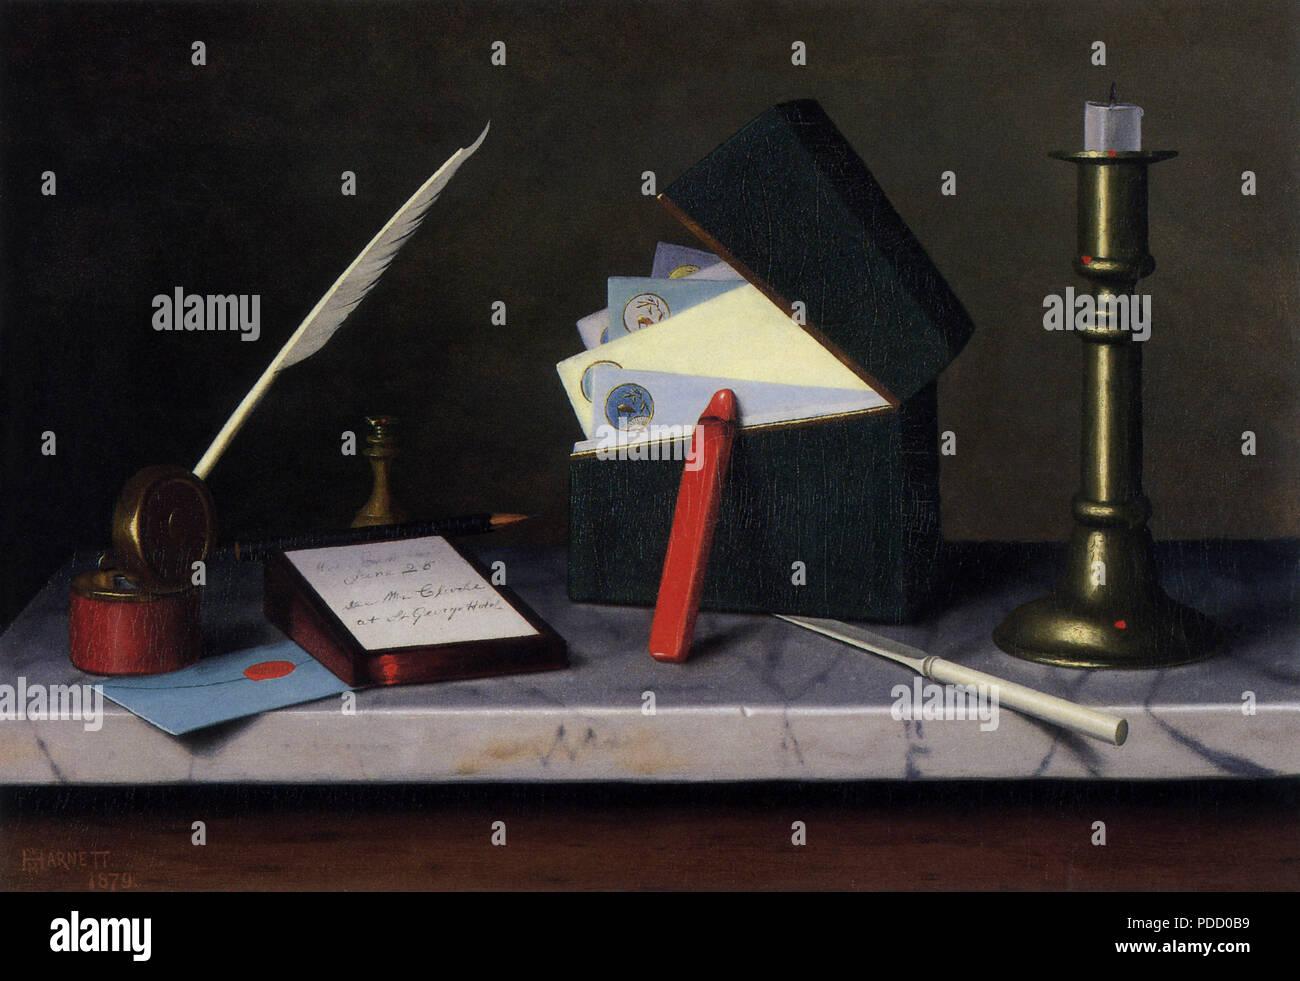 Secretary's Table, Harnett, William M., 1879. - Stock Image